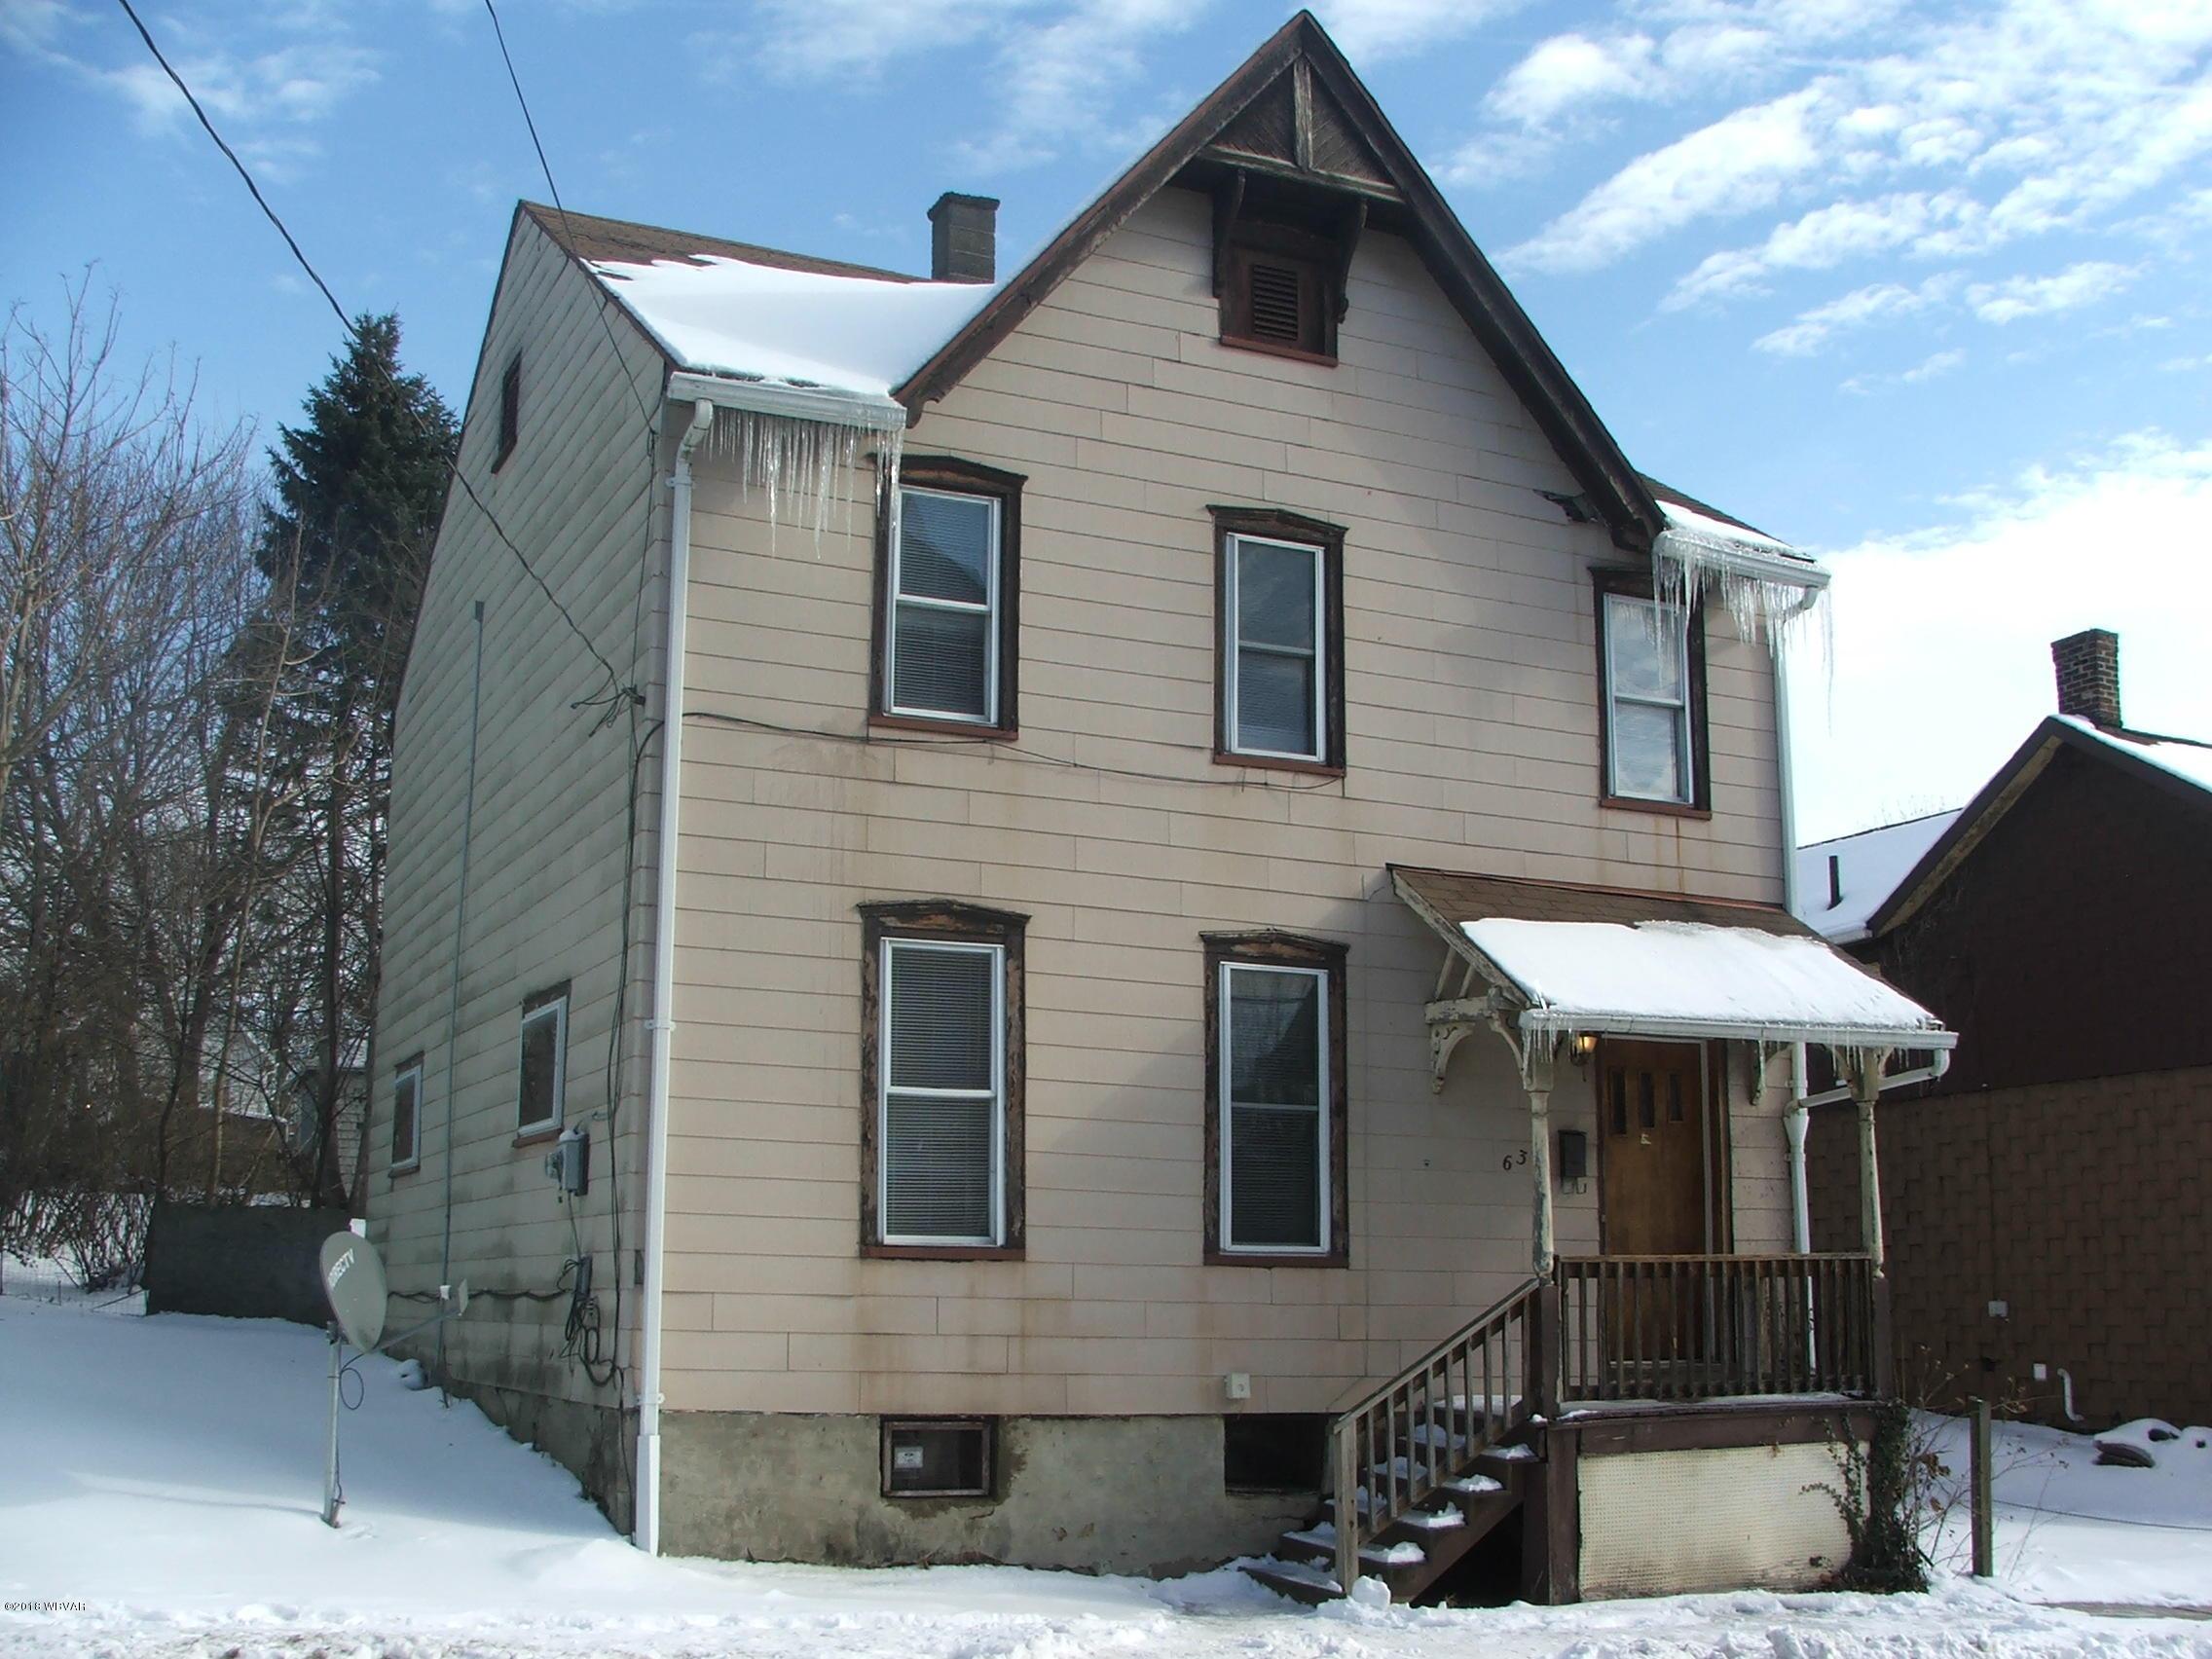 634 FRANKLIN STREET,Williamsport,PA 17701,4 Bedrooms Bedrooms,1 BathroomBathrooms,Residential,FRANKLIN,WB-83001